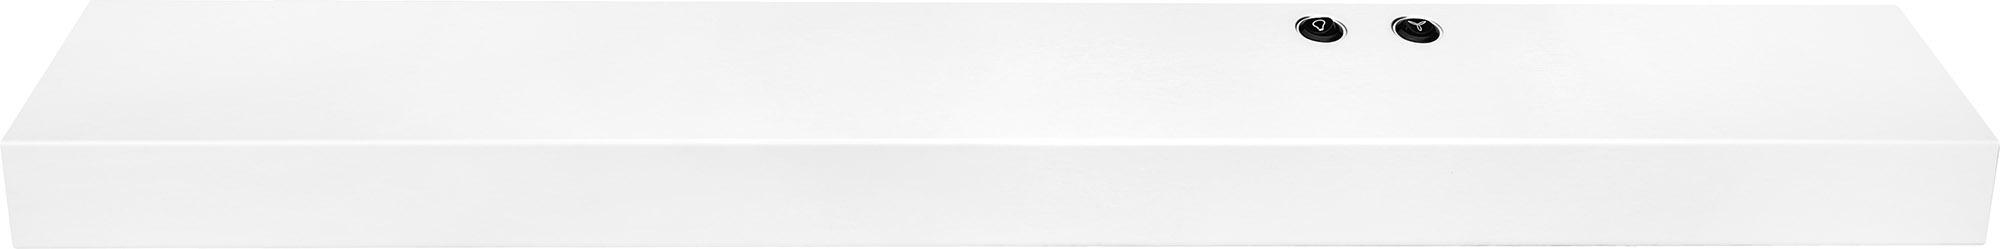 "Frigidaire Ventilation 36"" Under-the-Cabinet Range Hood - Item Number: FHWC3625MW"